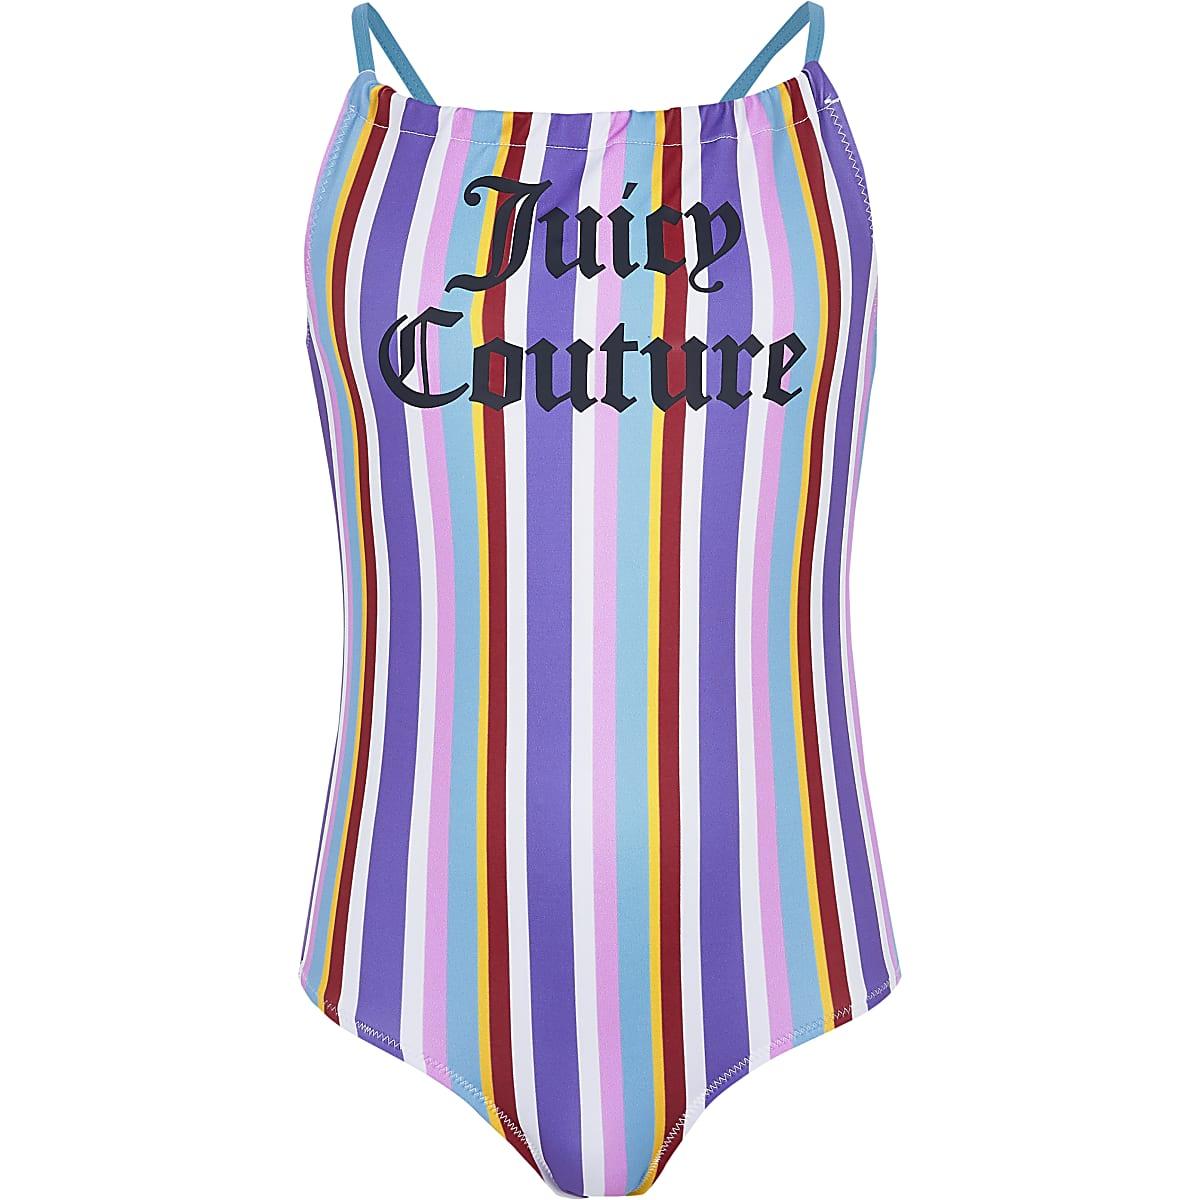 Juicy Couture blue stripe swimsuit